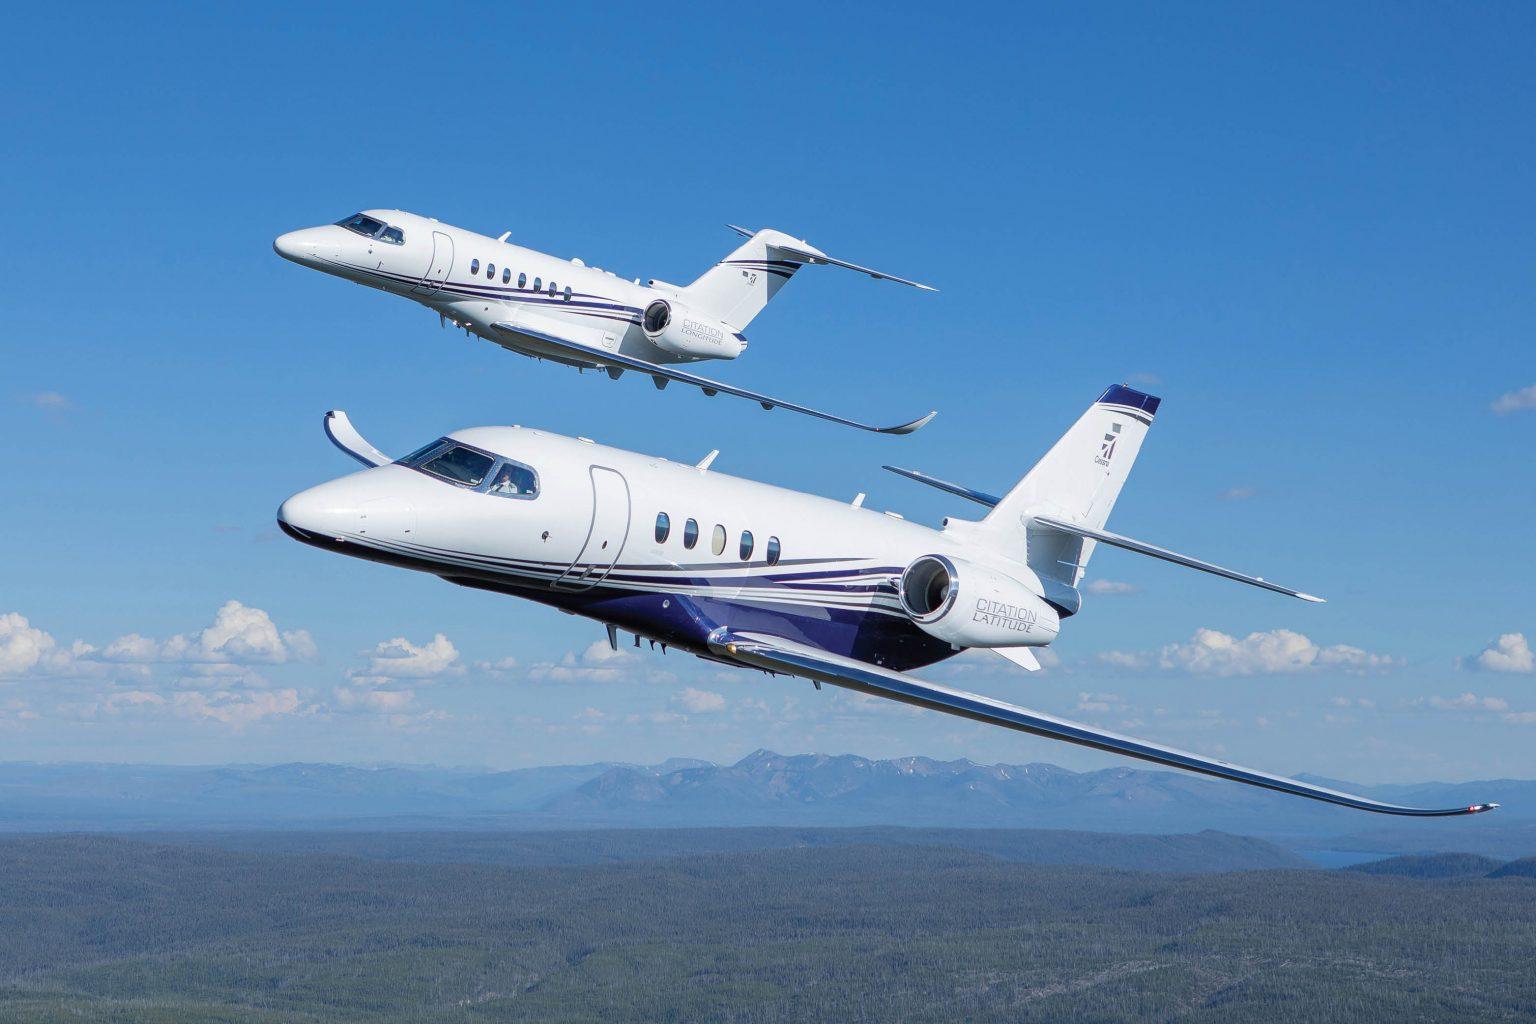 Textron Aviation airplanes